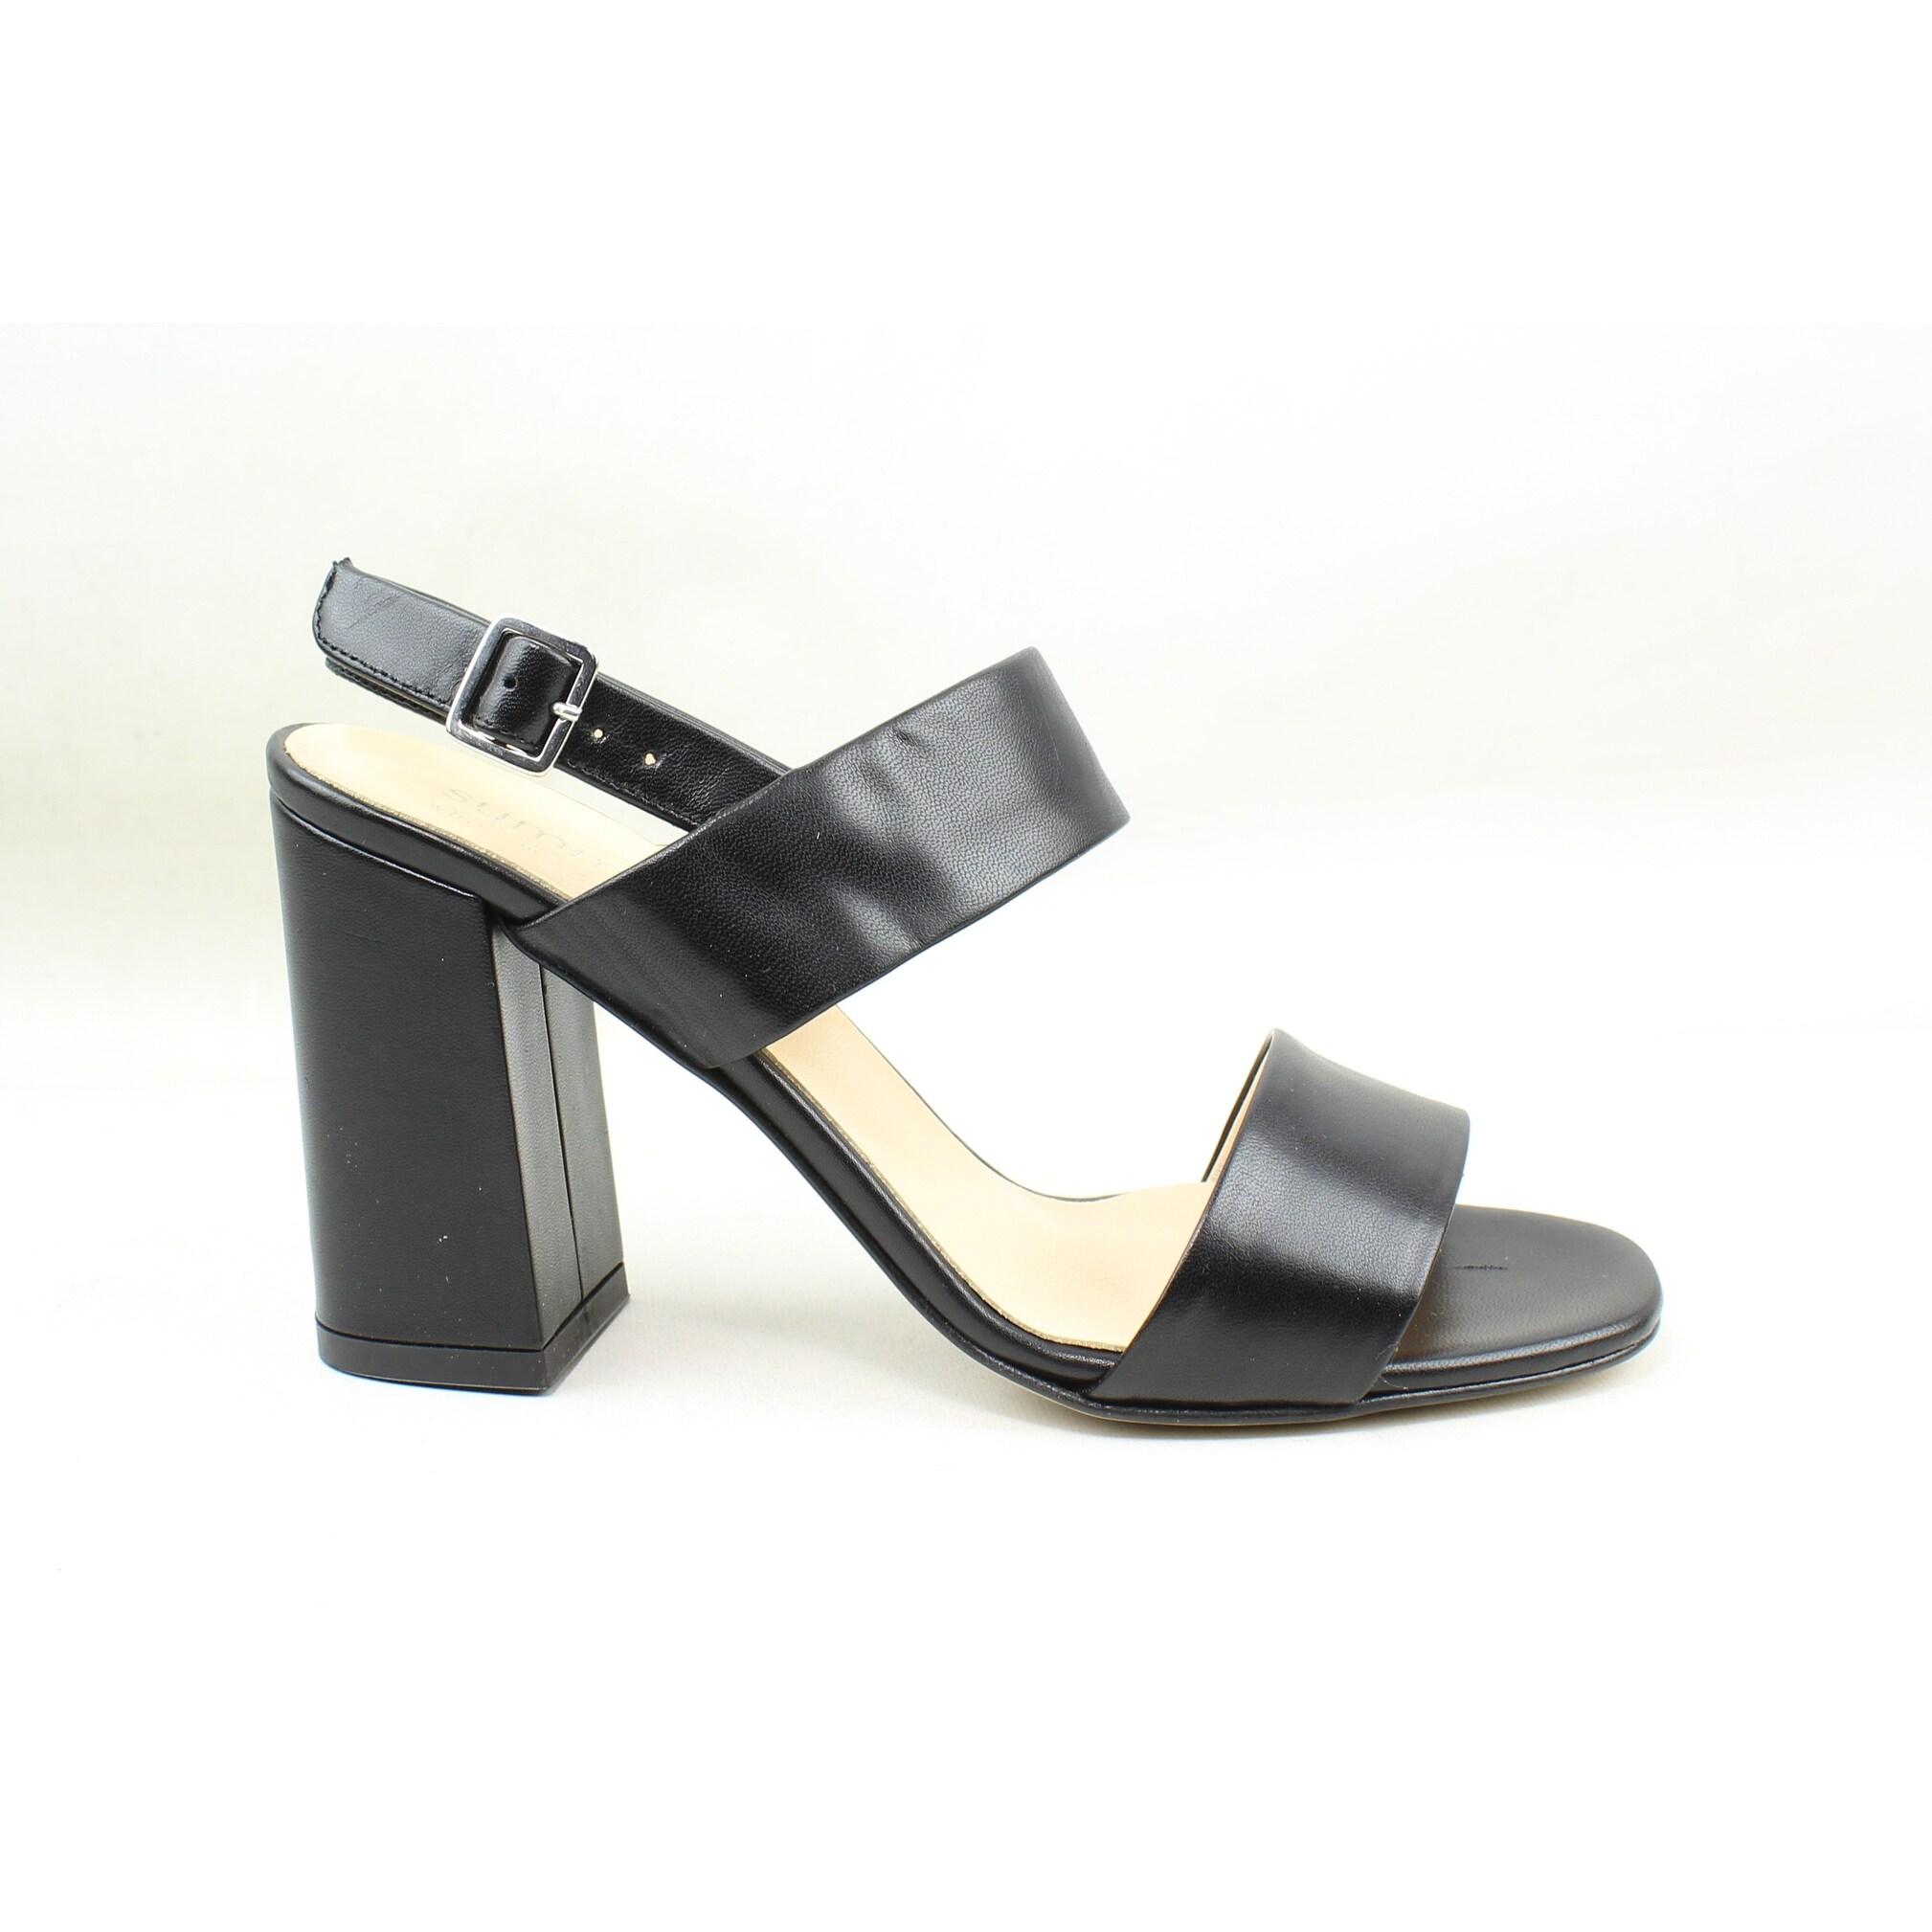 Shop Summit Womens Morna Black Leather Slingbacks EUR 38 - Free ... af79f14c683c